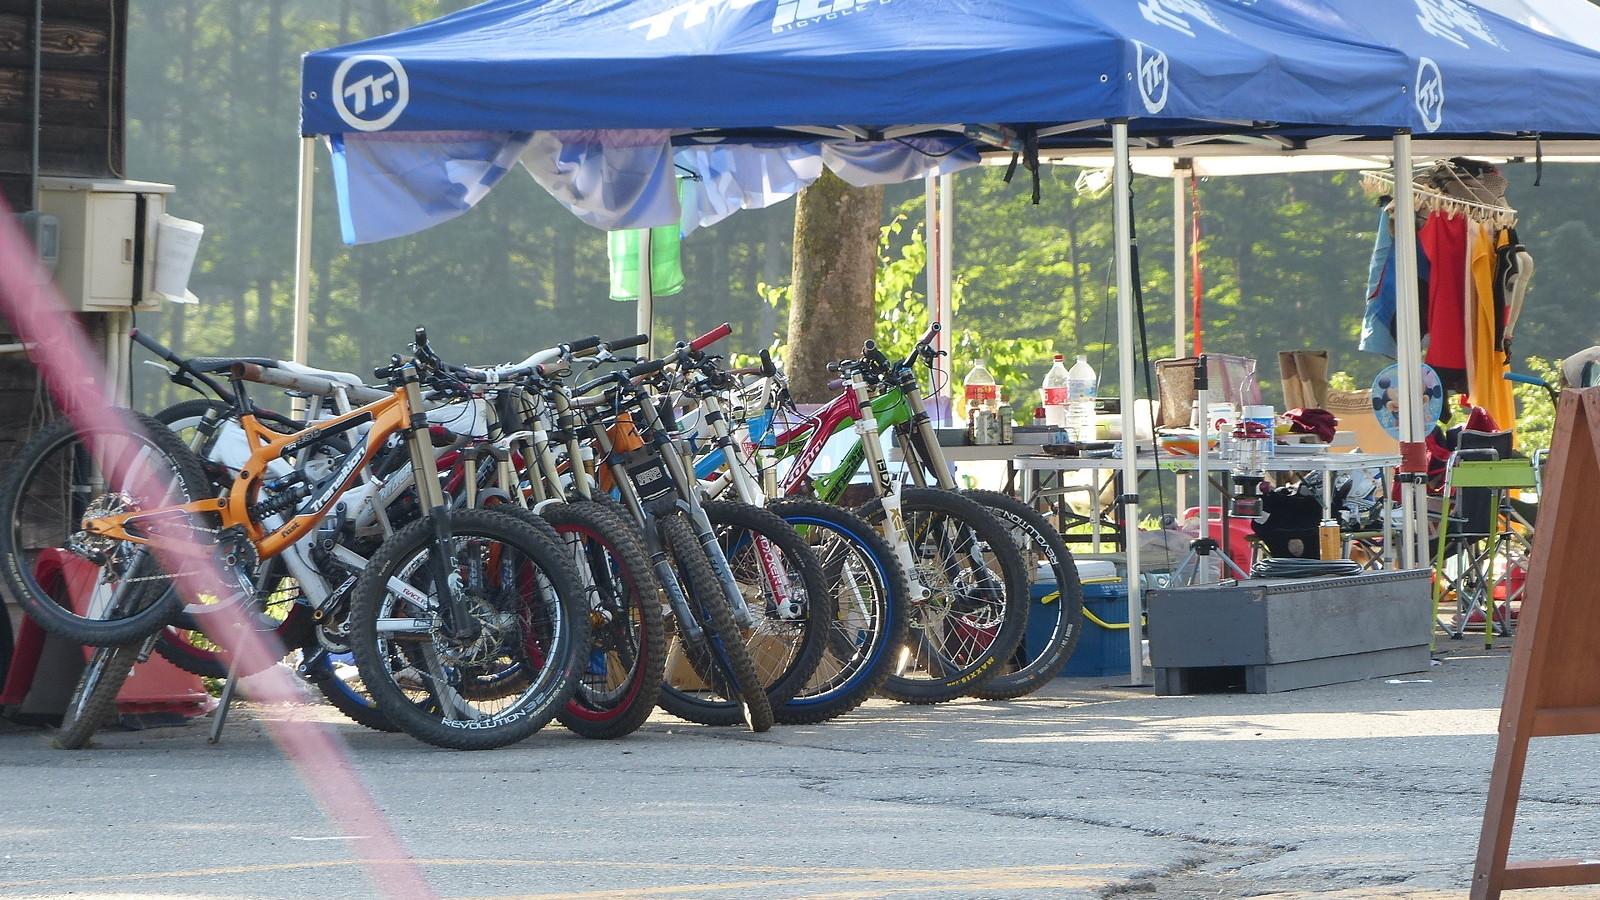 P1000424 - kote - Mountain Biking Pictures - Vital MTB